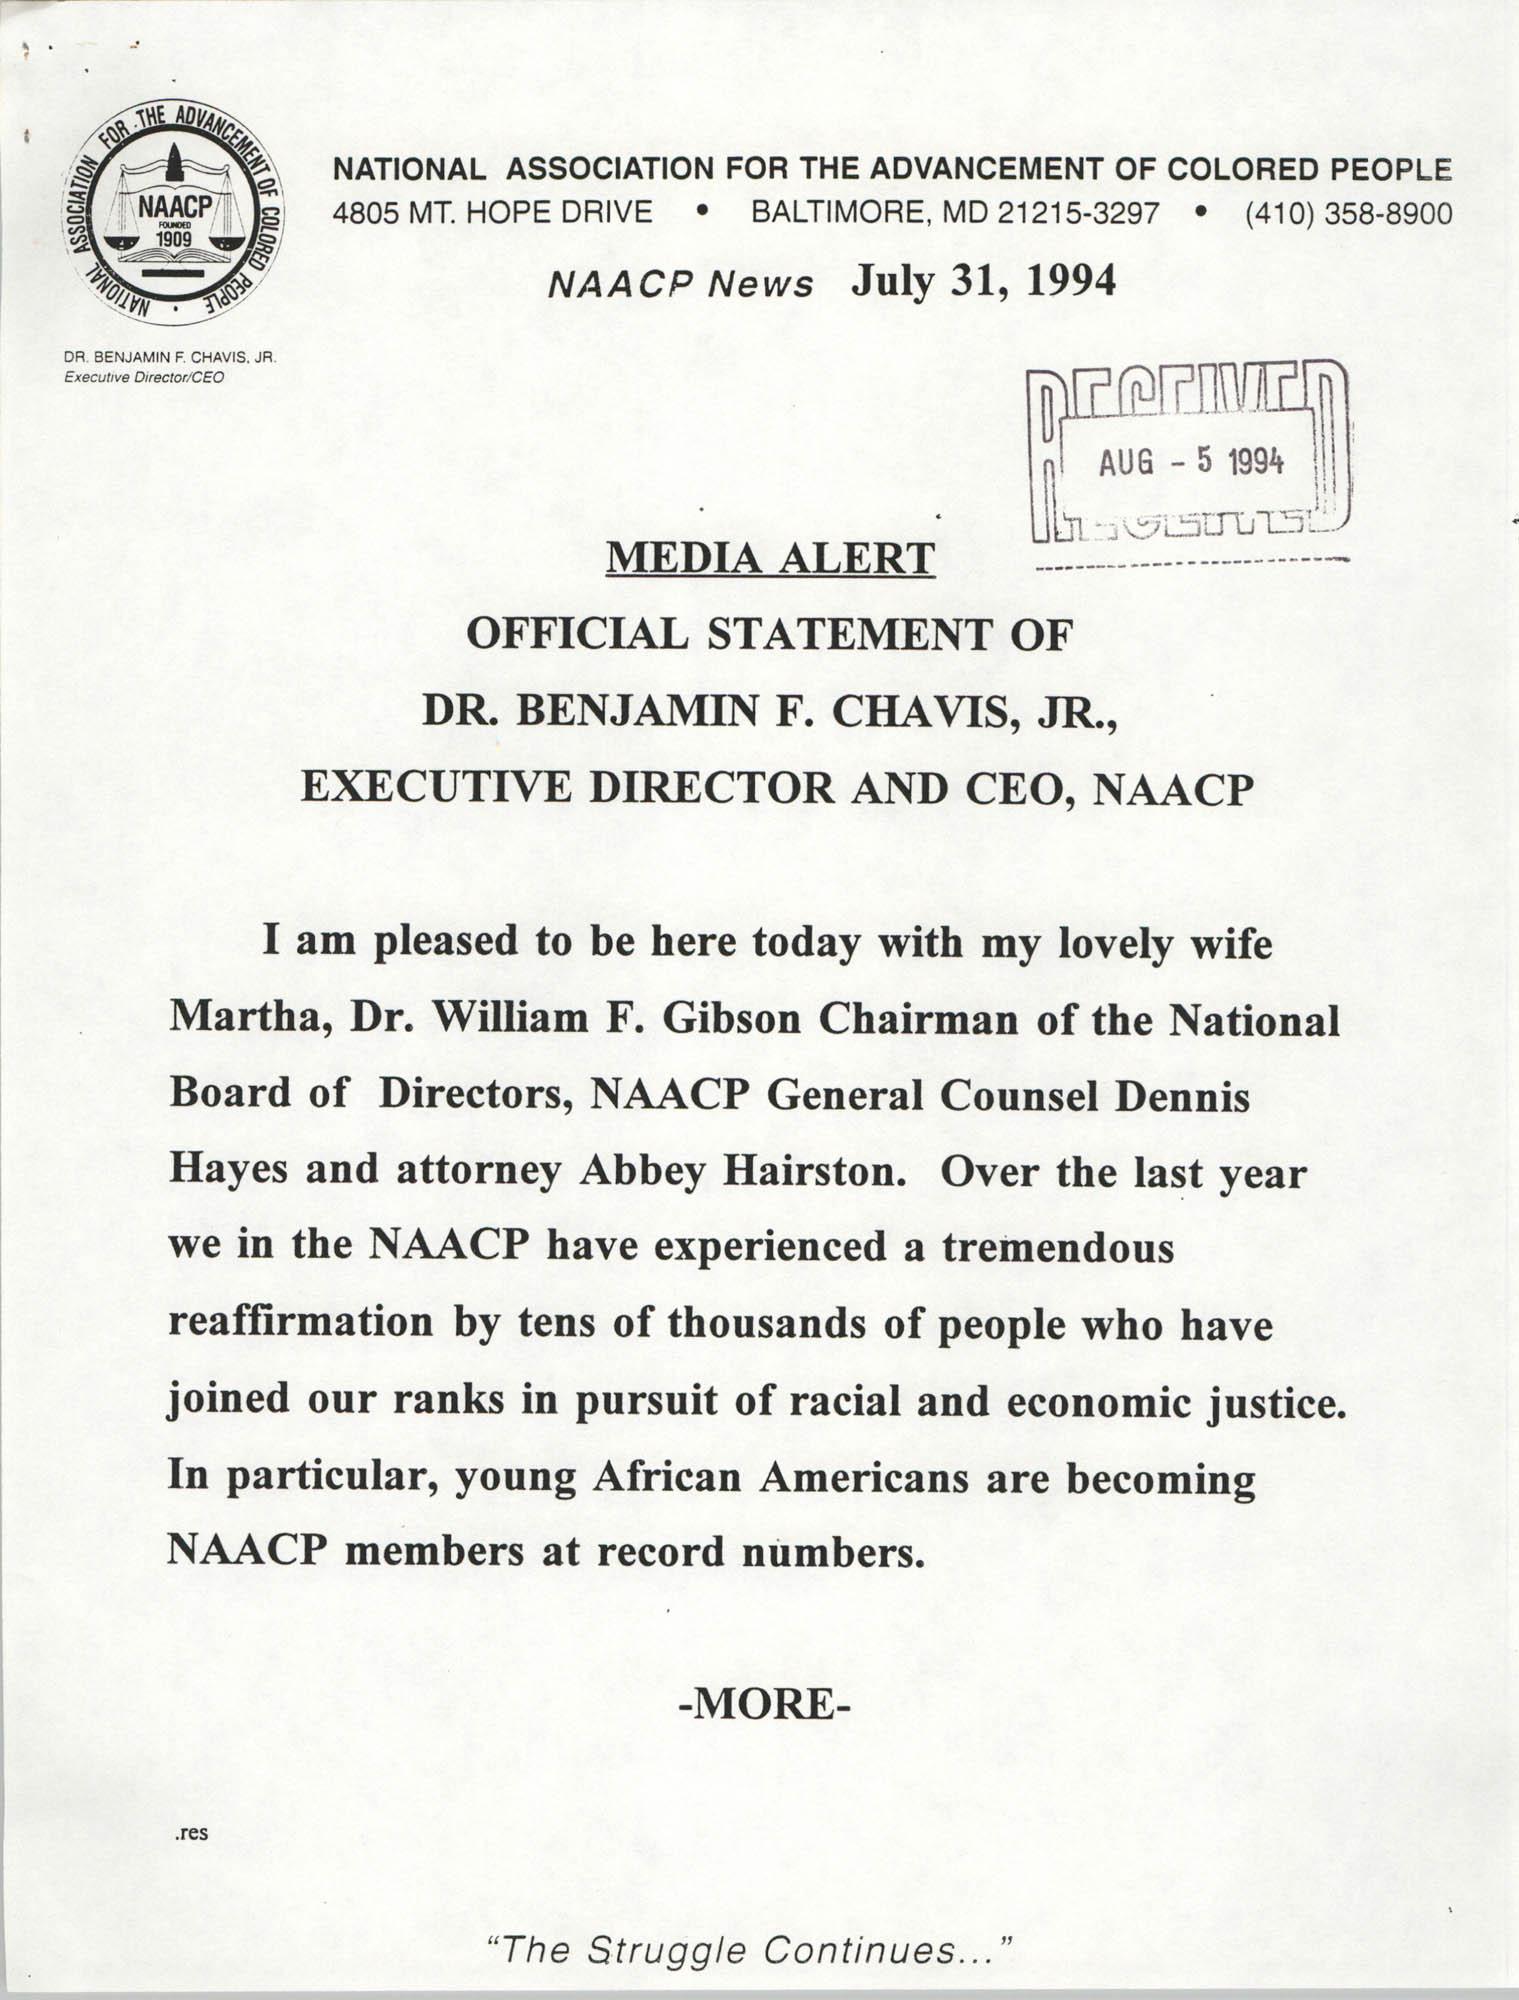 NAACP Media Alert, Official Statement of Dr. Benjamin F. Chavis, Jr.